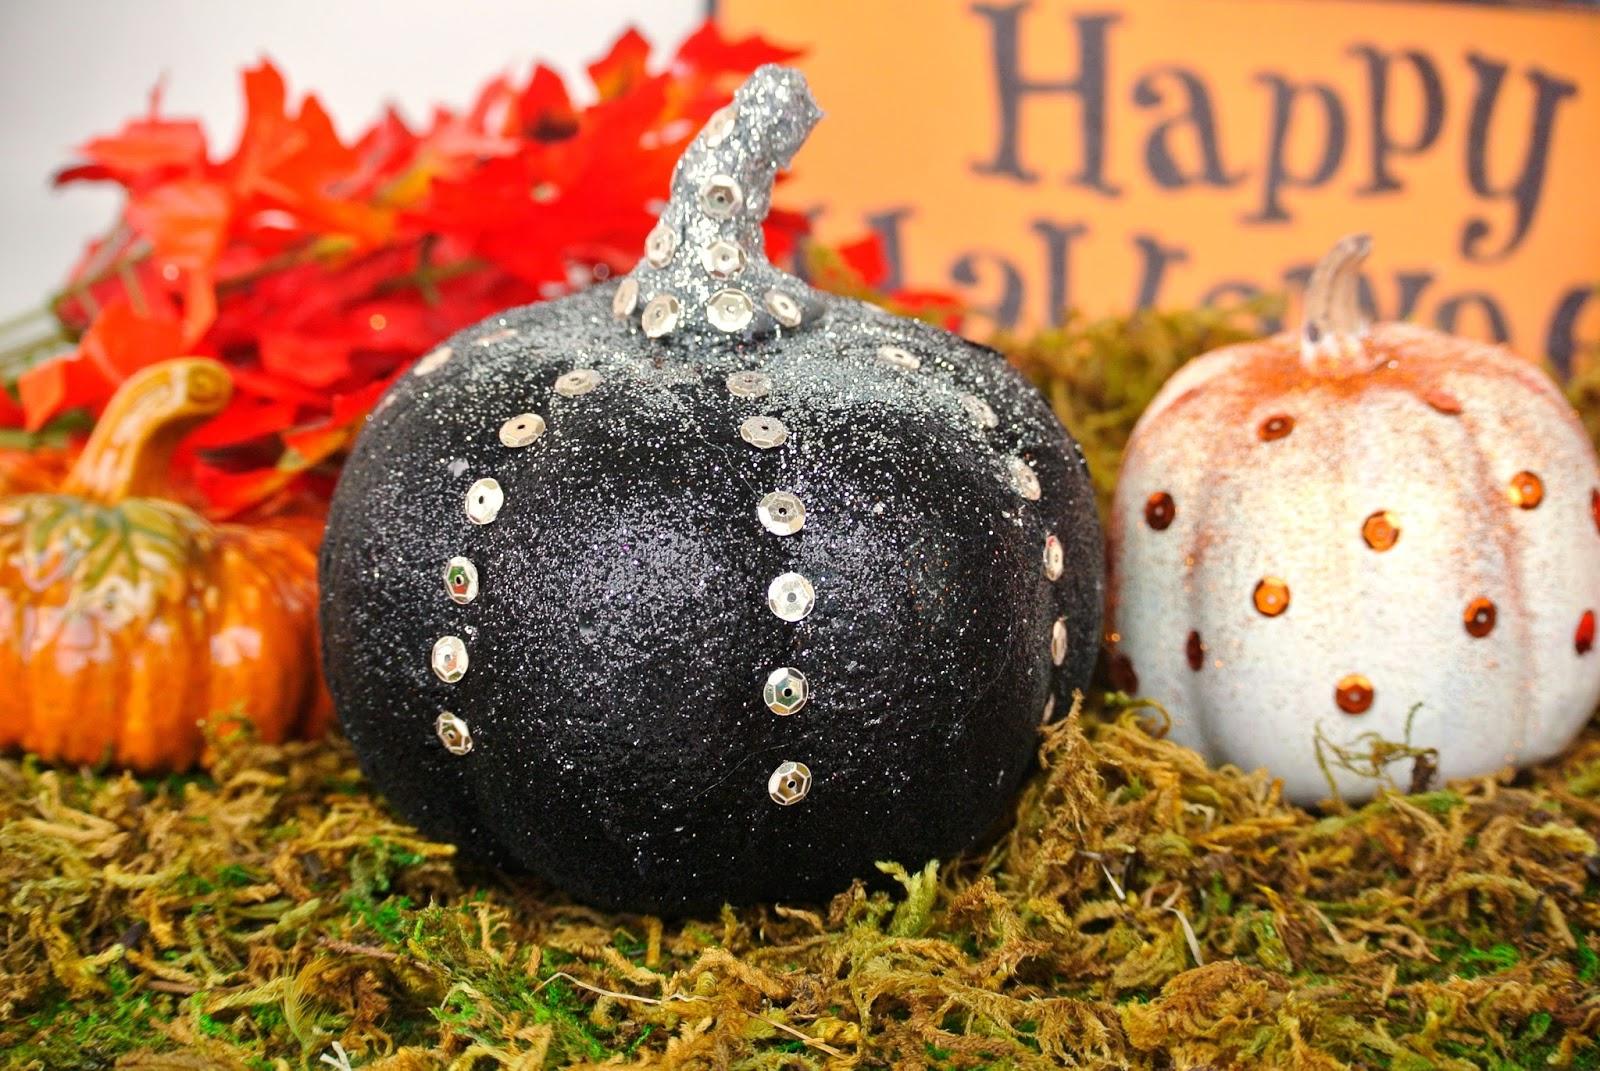 Funny decorated pumpkins